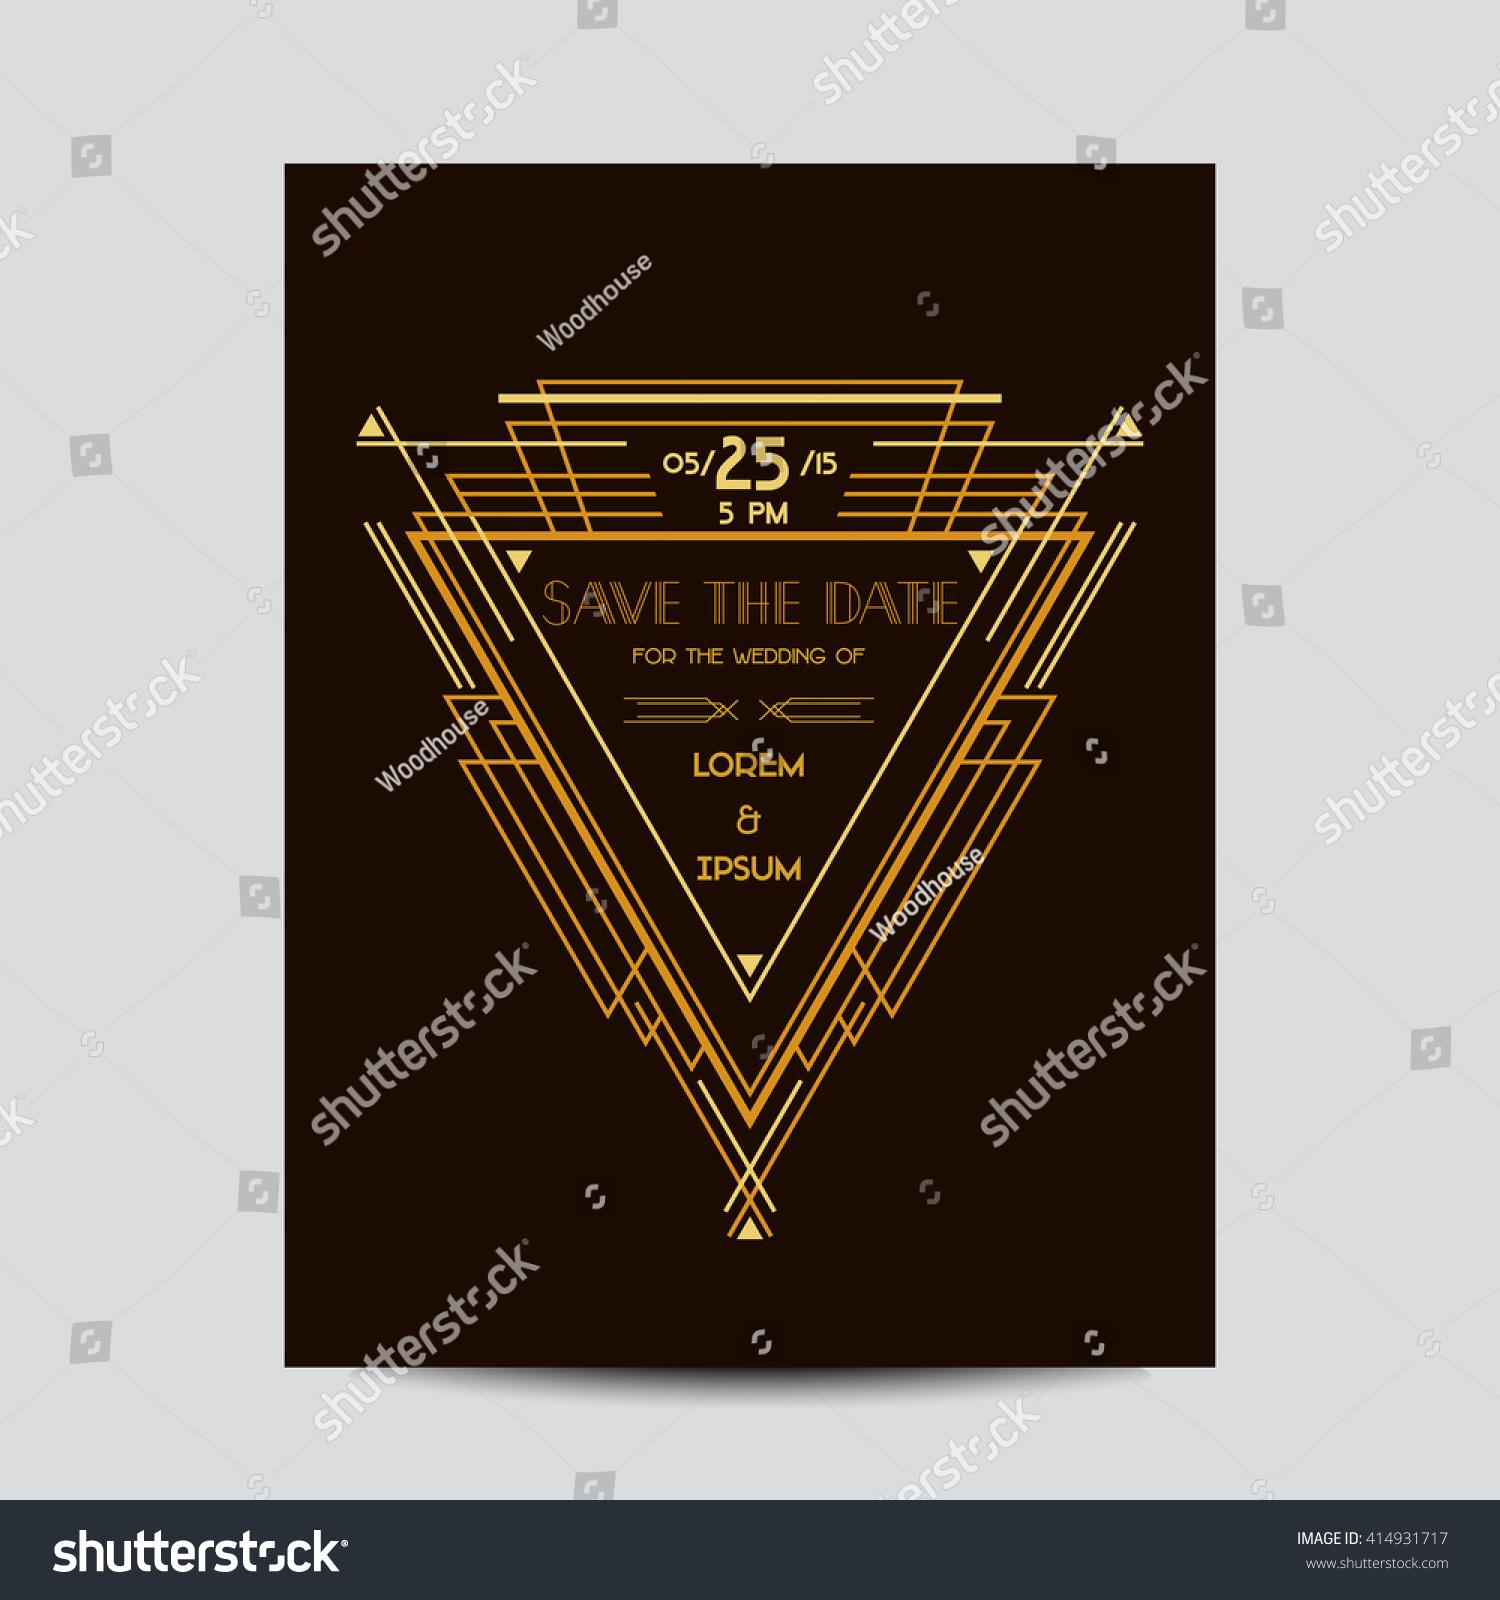 save date wedding invitation card art stock vector hd royalty free